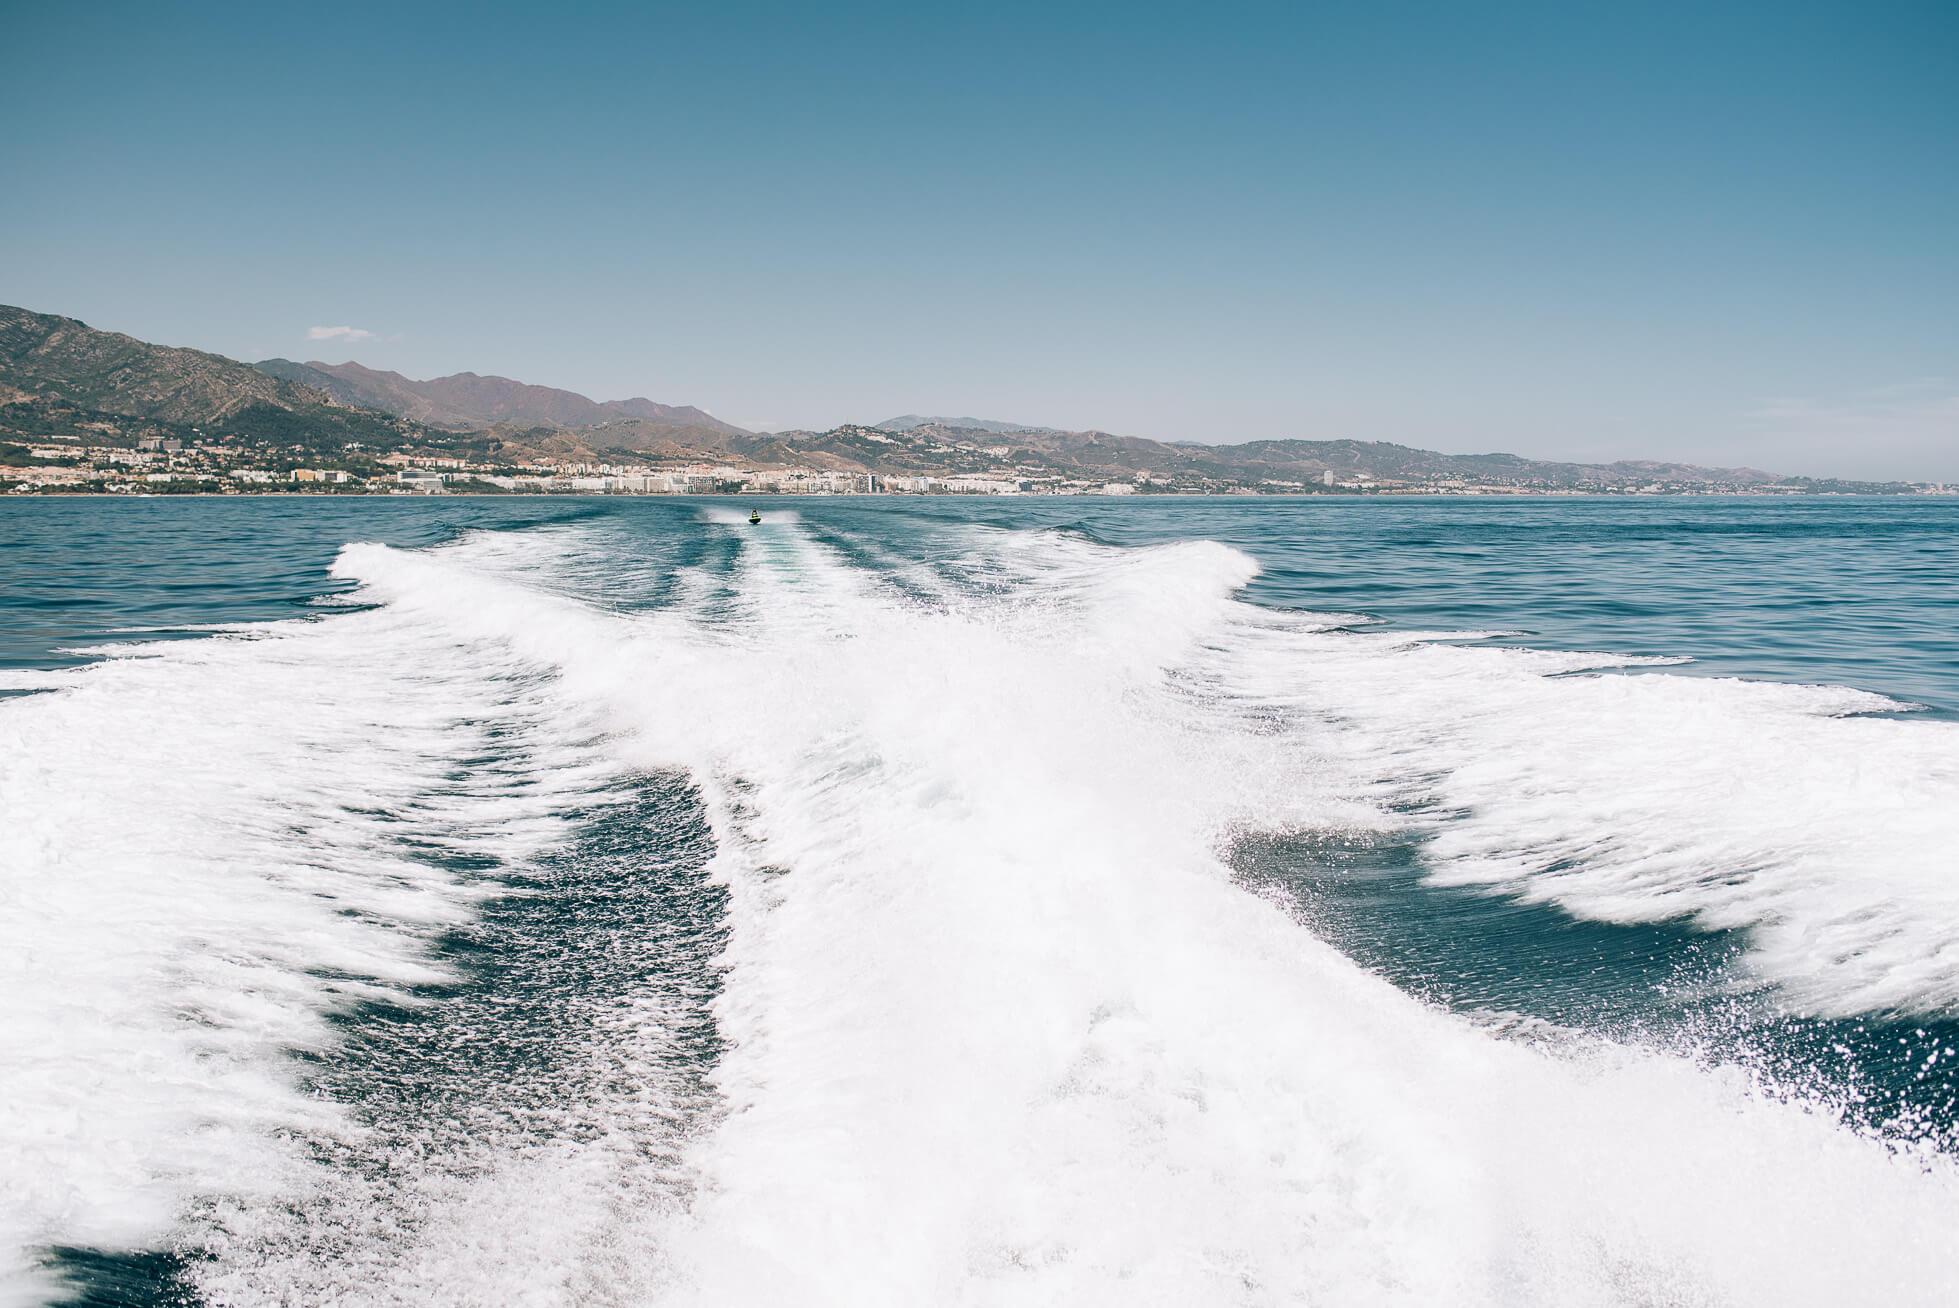 janni-deler-boat-dayDSC_7699